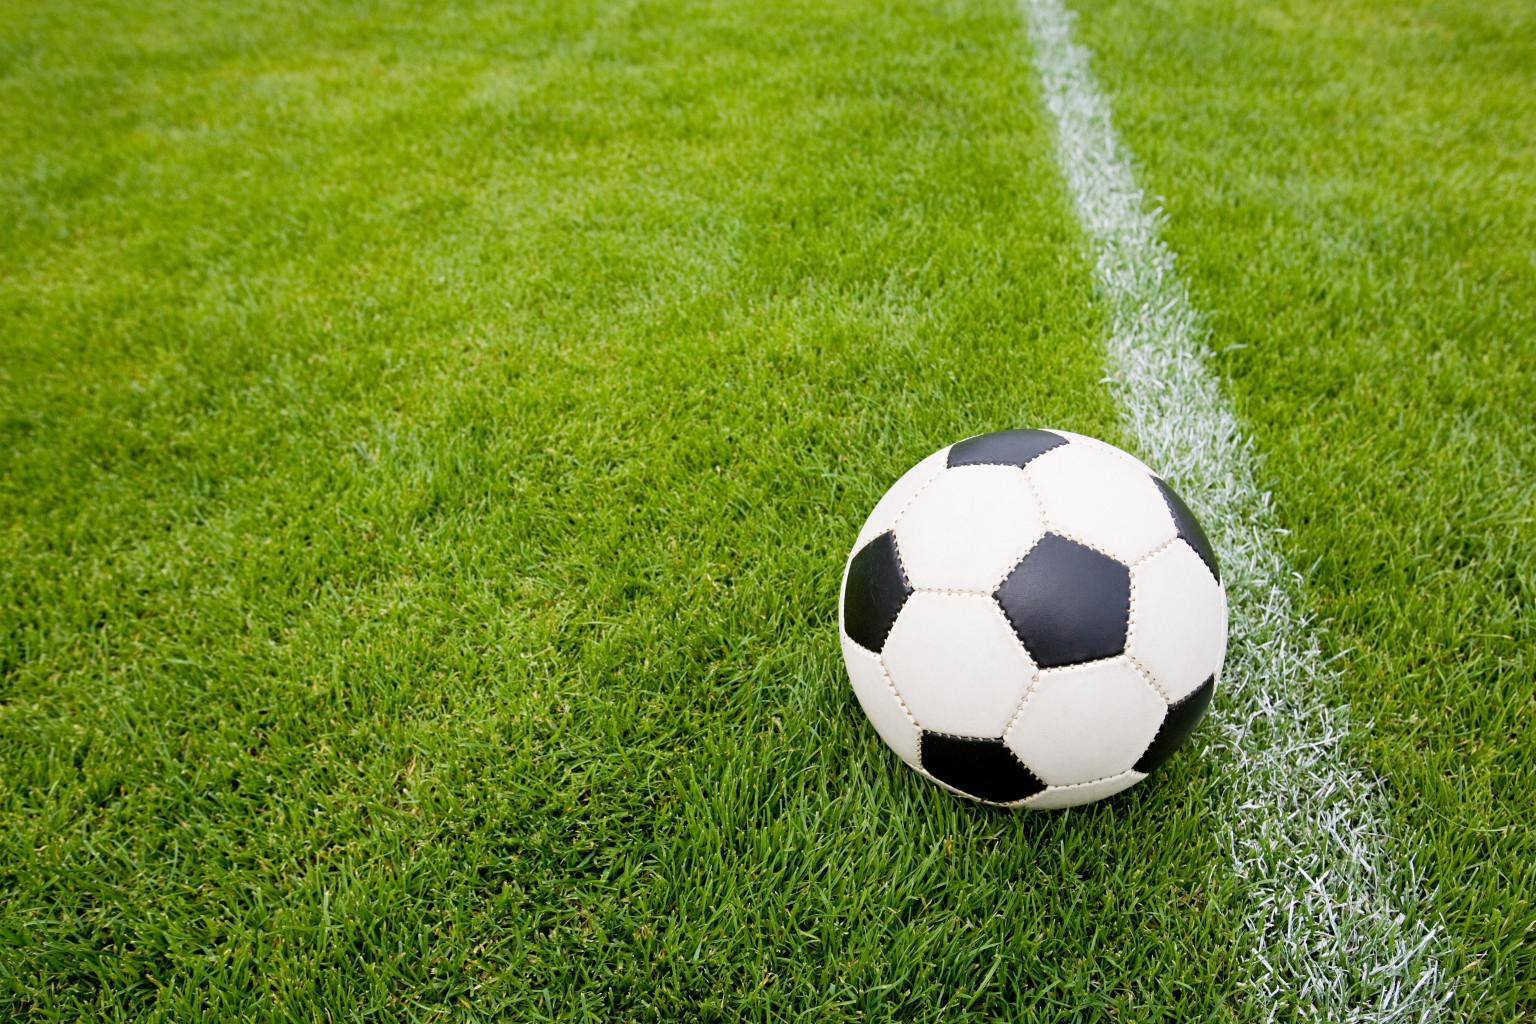 Gambia Football Federation cancels current domestic season - Sports Leo